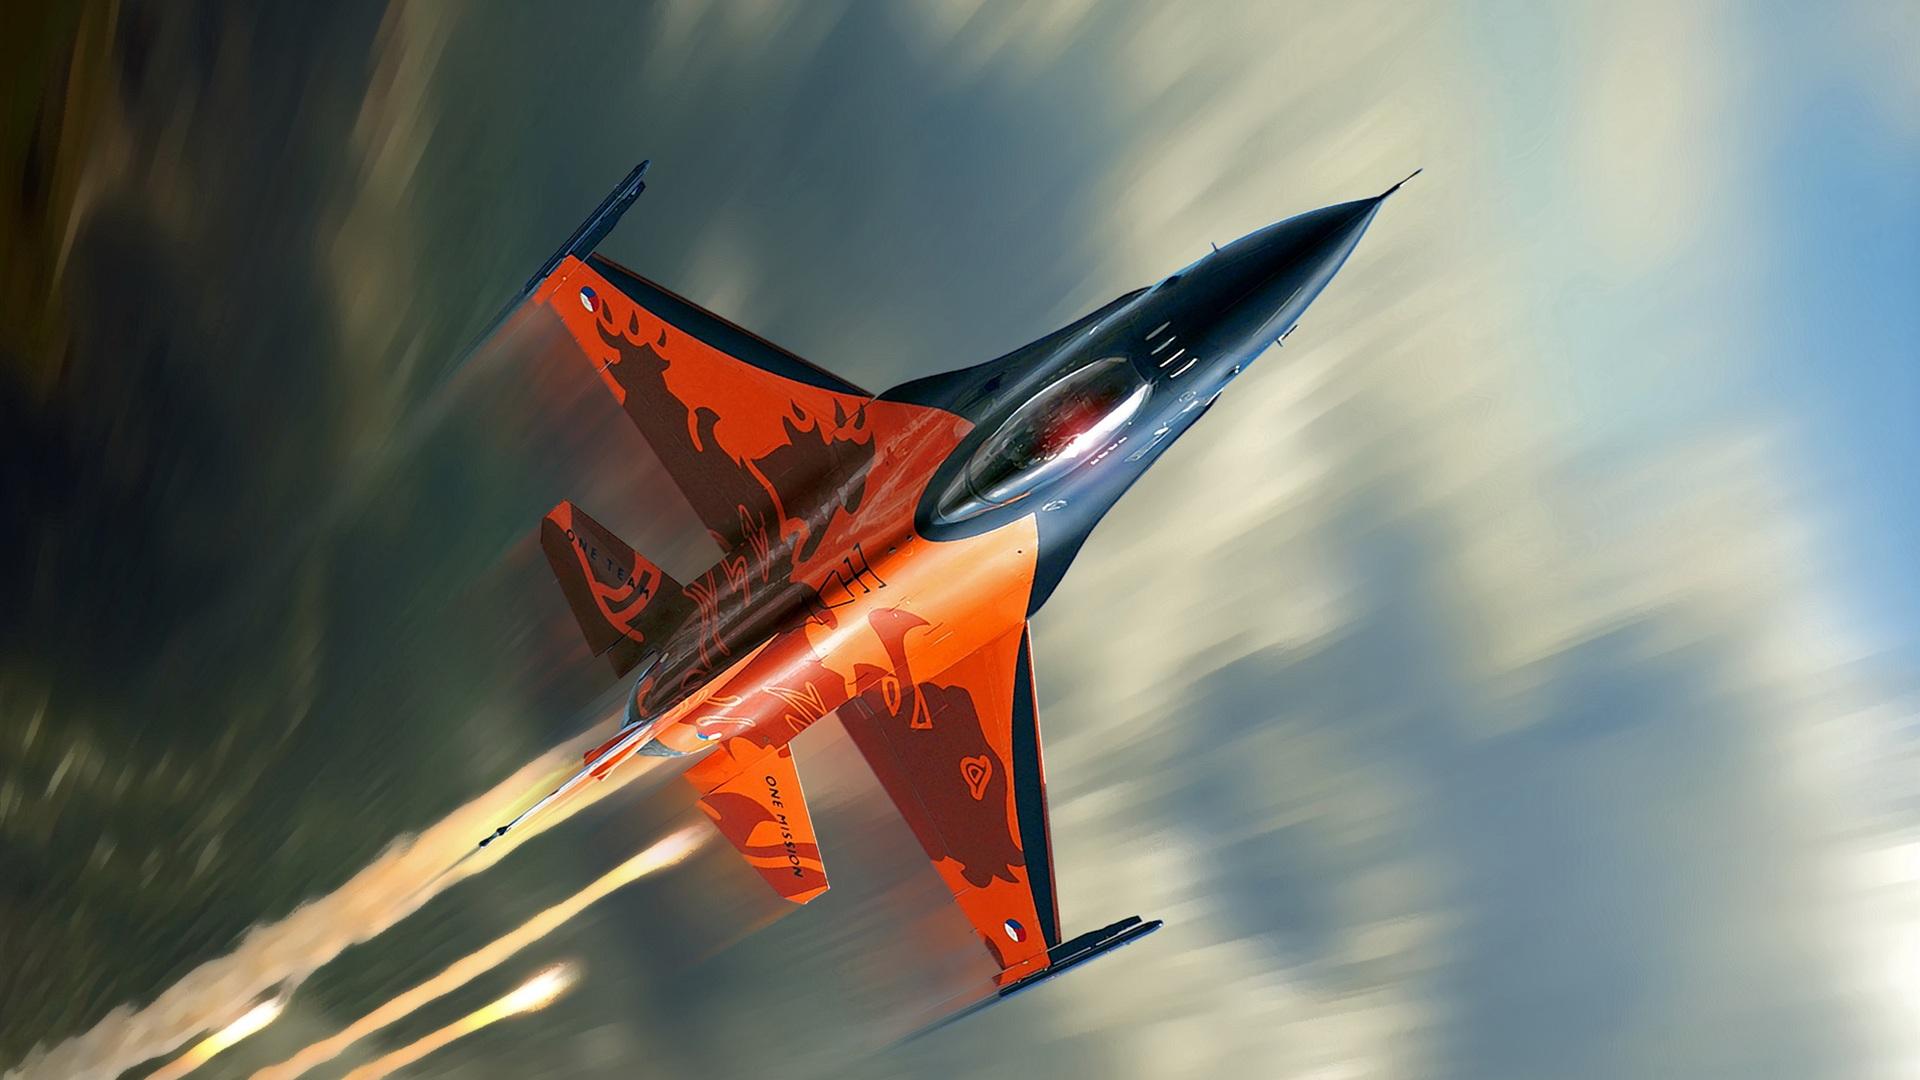 F 16 (戦闘機)の画像 p1_34